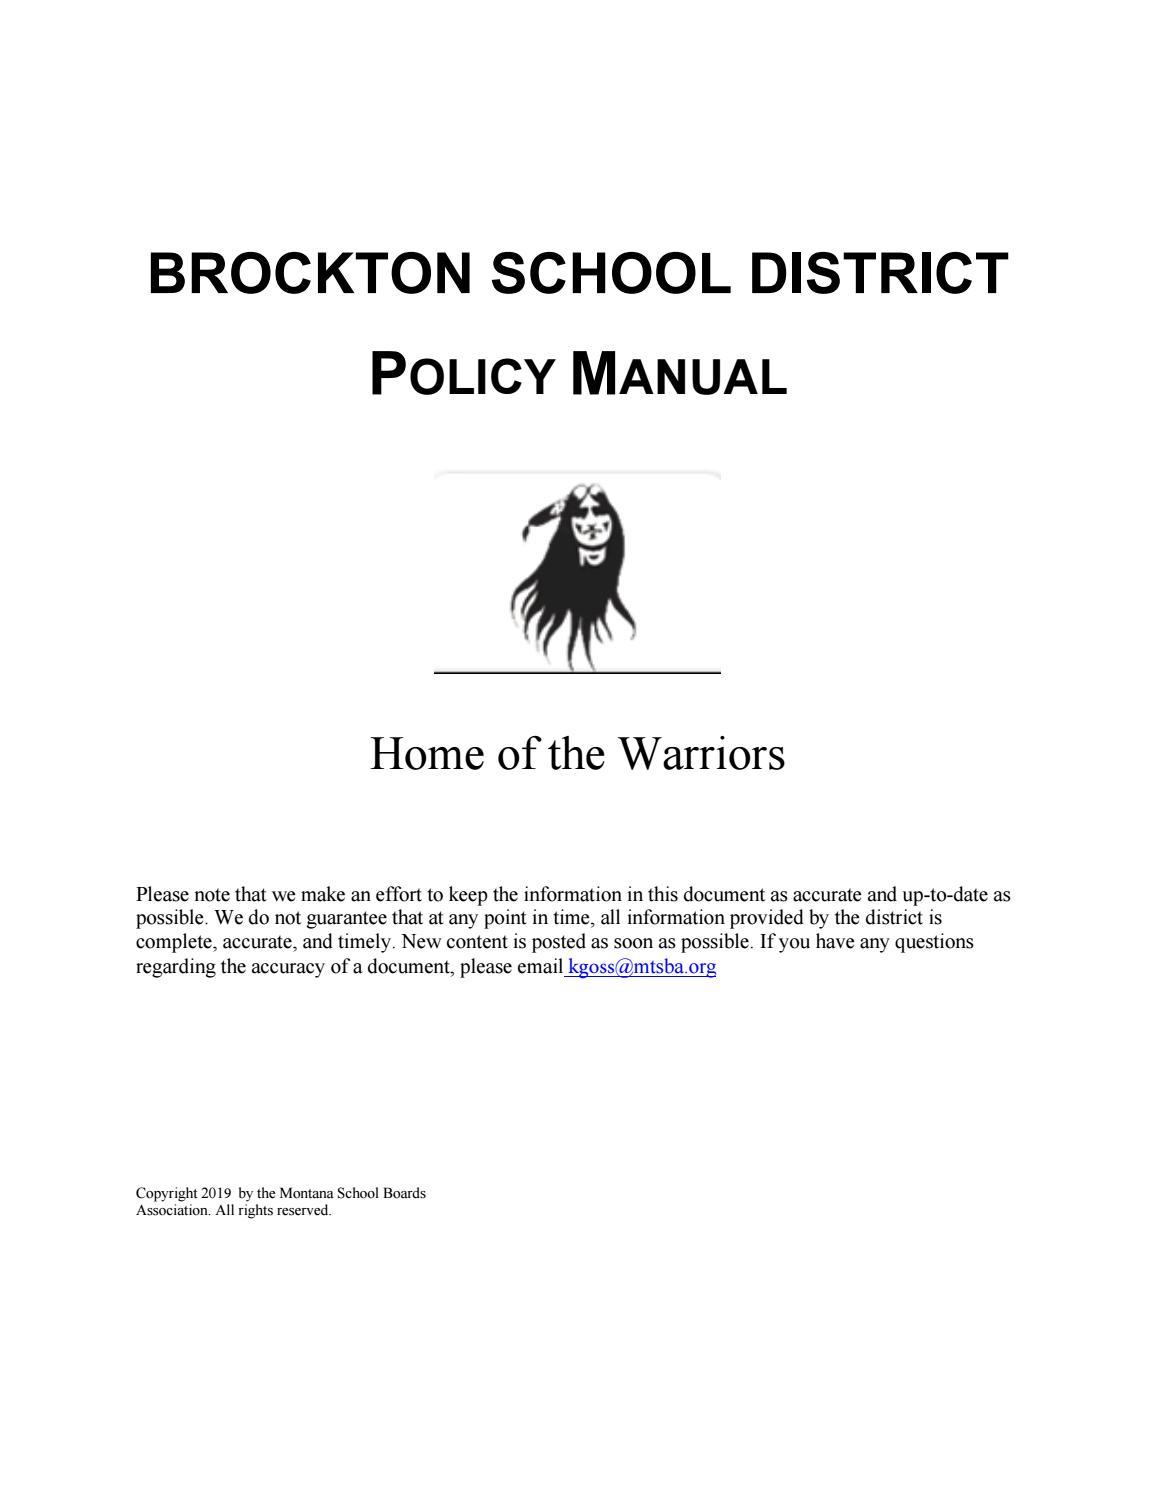 Brockton School District Policy Manual by Montana School